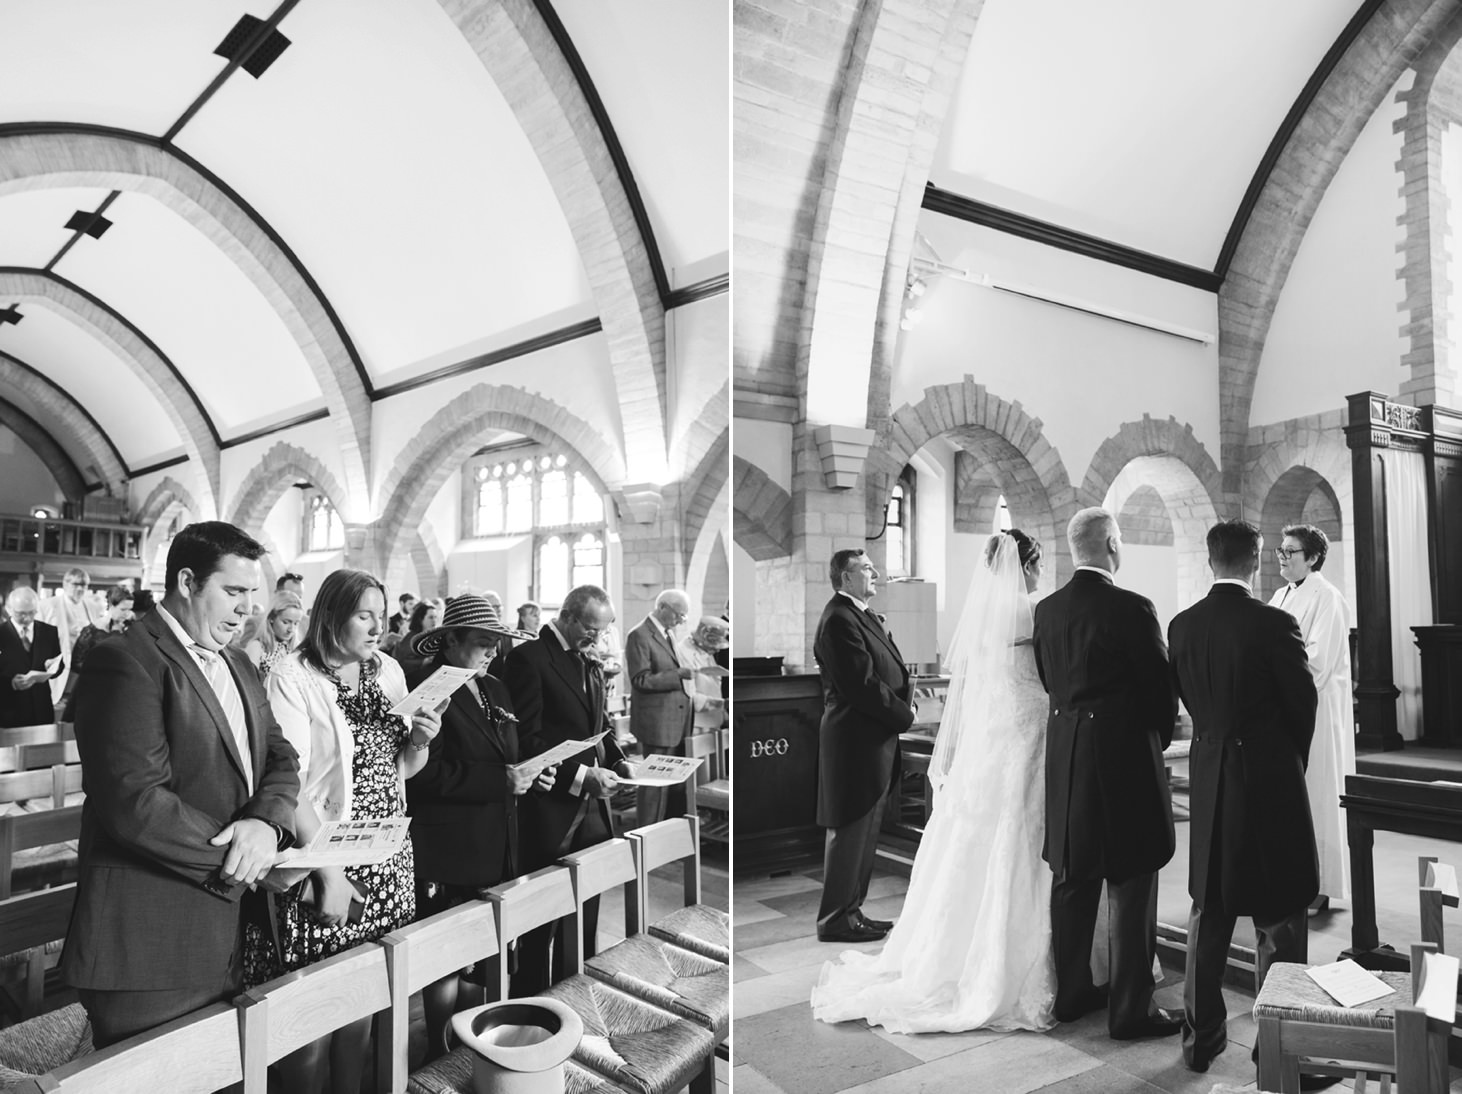 Wycombe Abbey wedding photography wedding ceremony